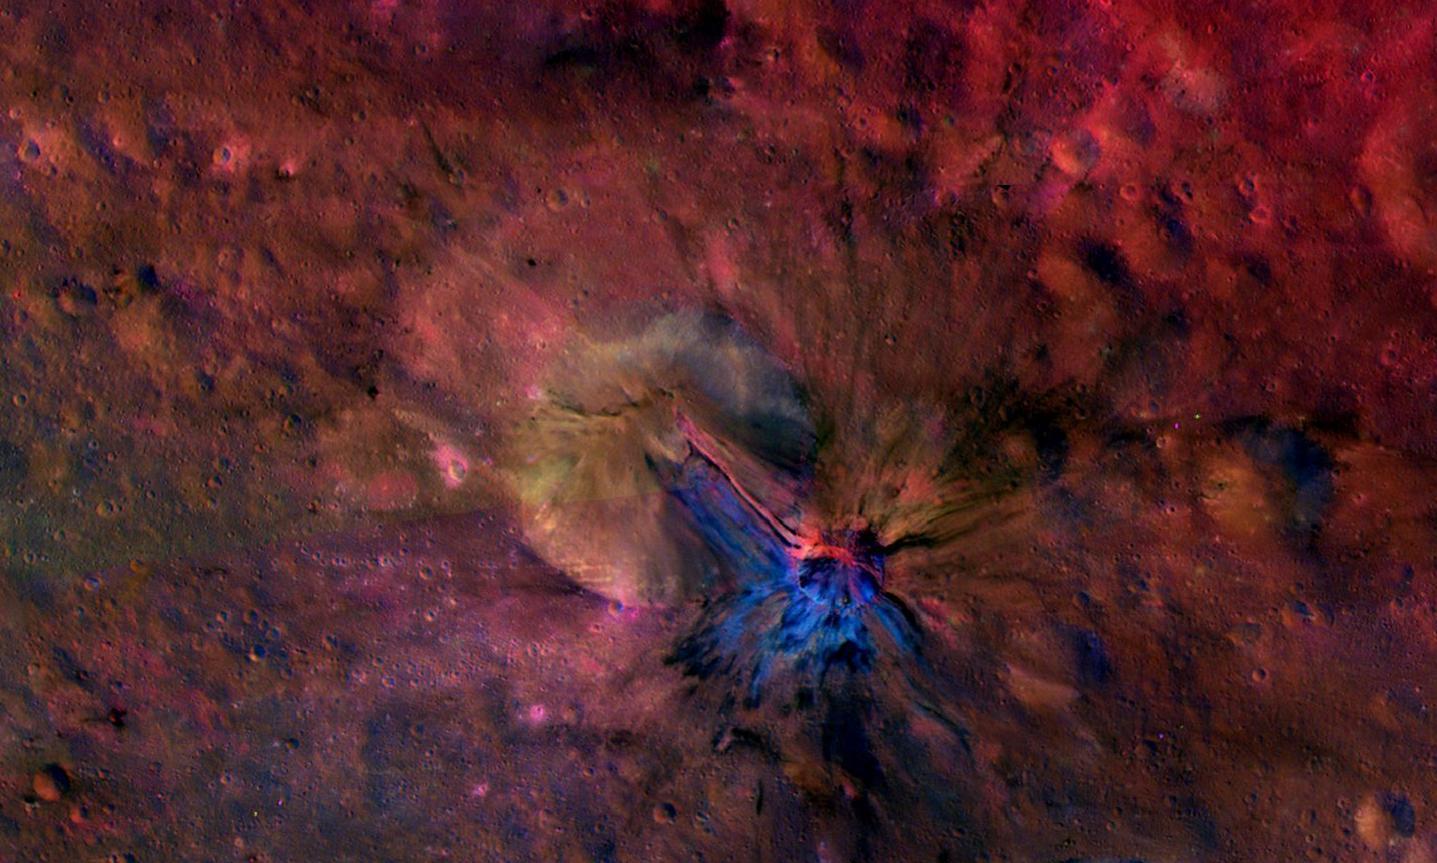 Huge Asteroid Vesta Shines in Dazzling New Light (Images)